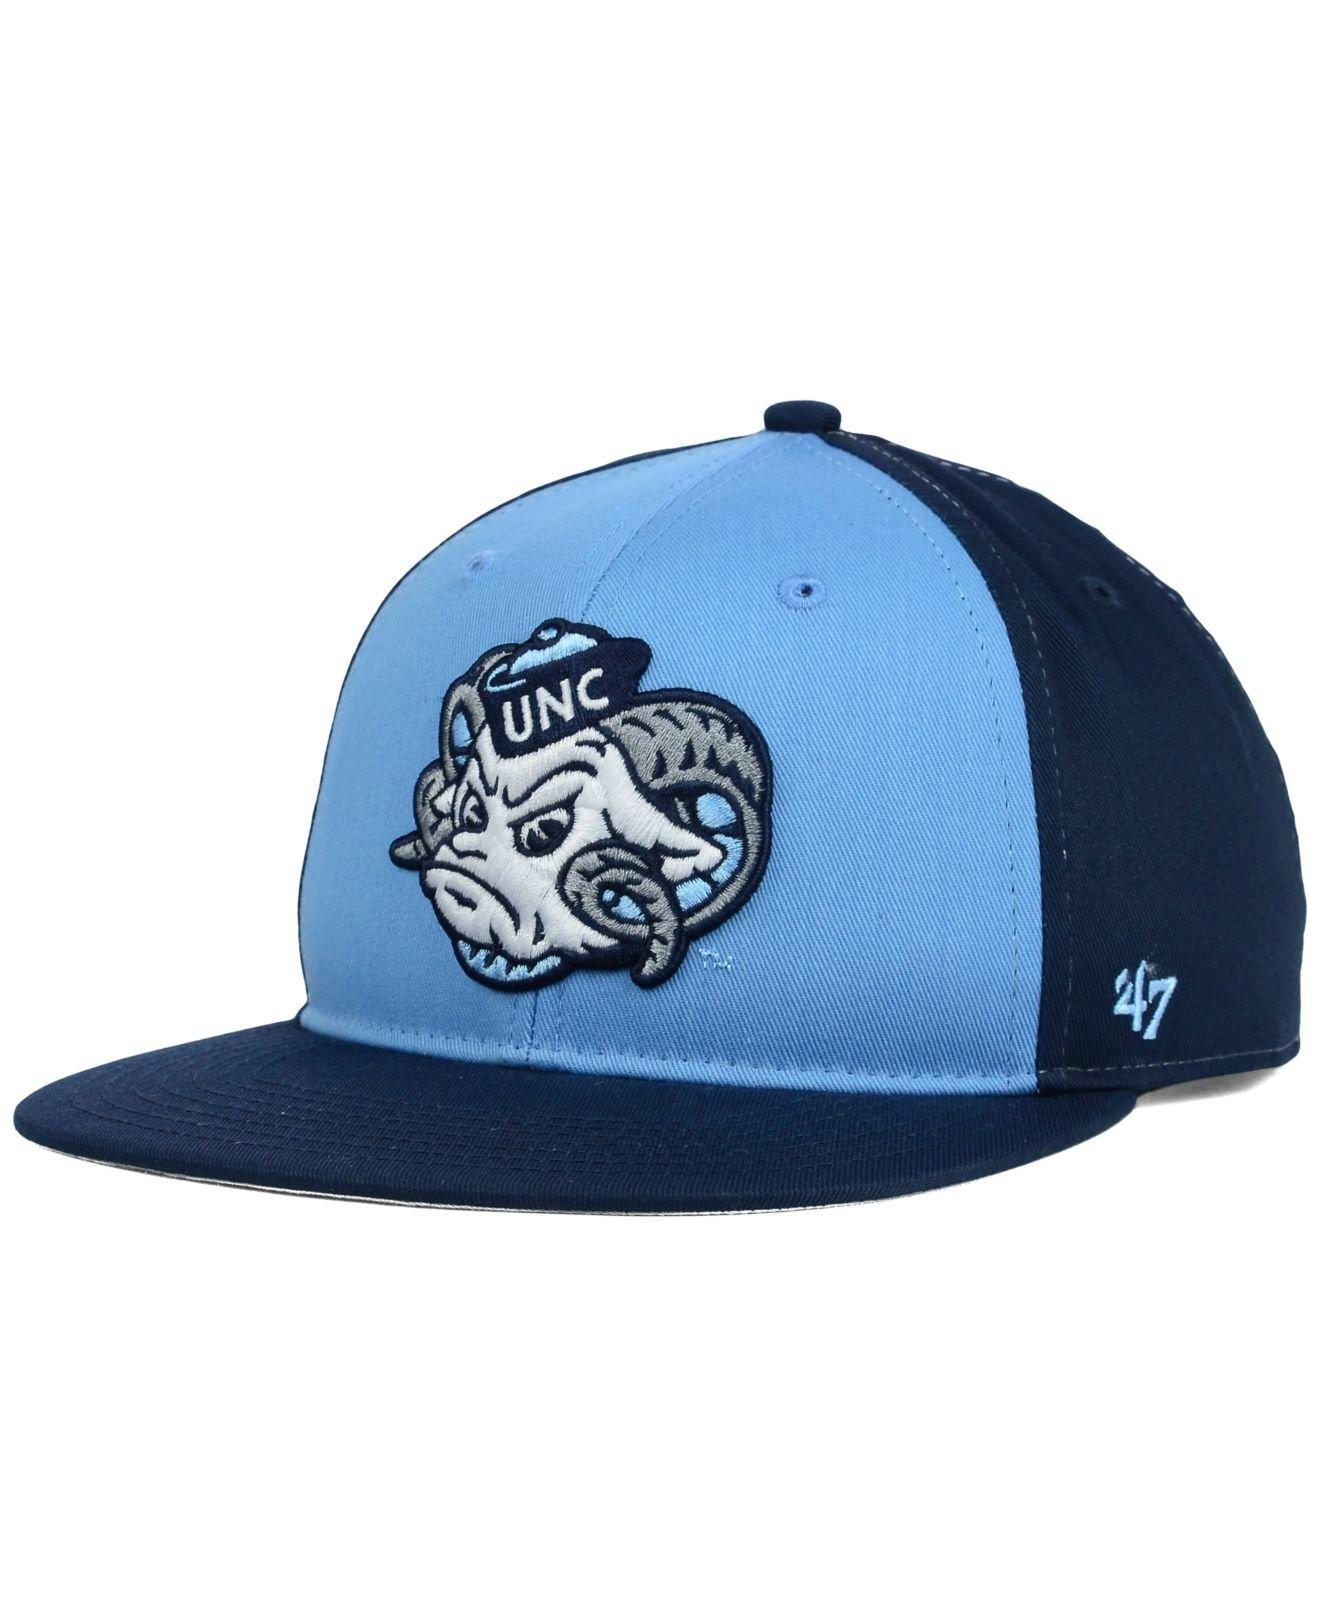 Lyst - 47 Brand Kids  North Carolina Tar Heels Snapback Cap in Blue 20431f02c4